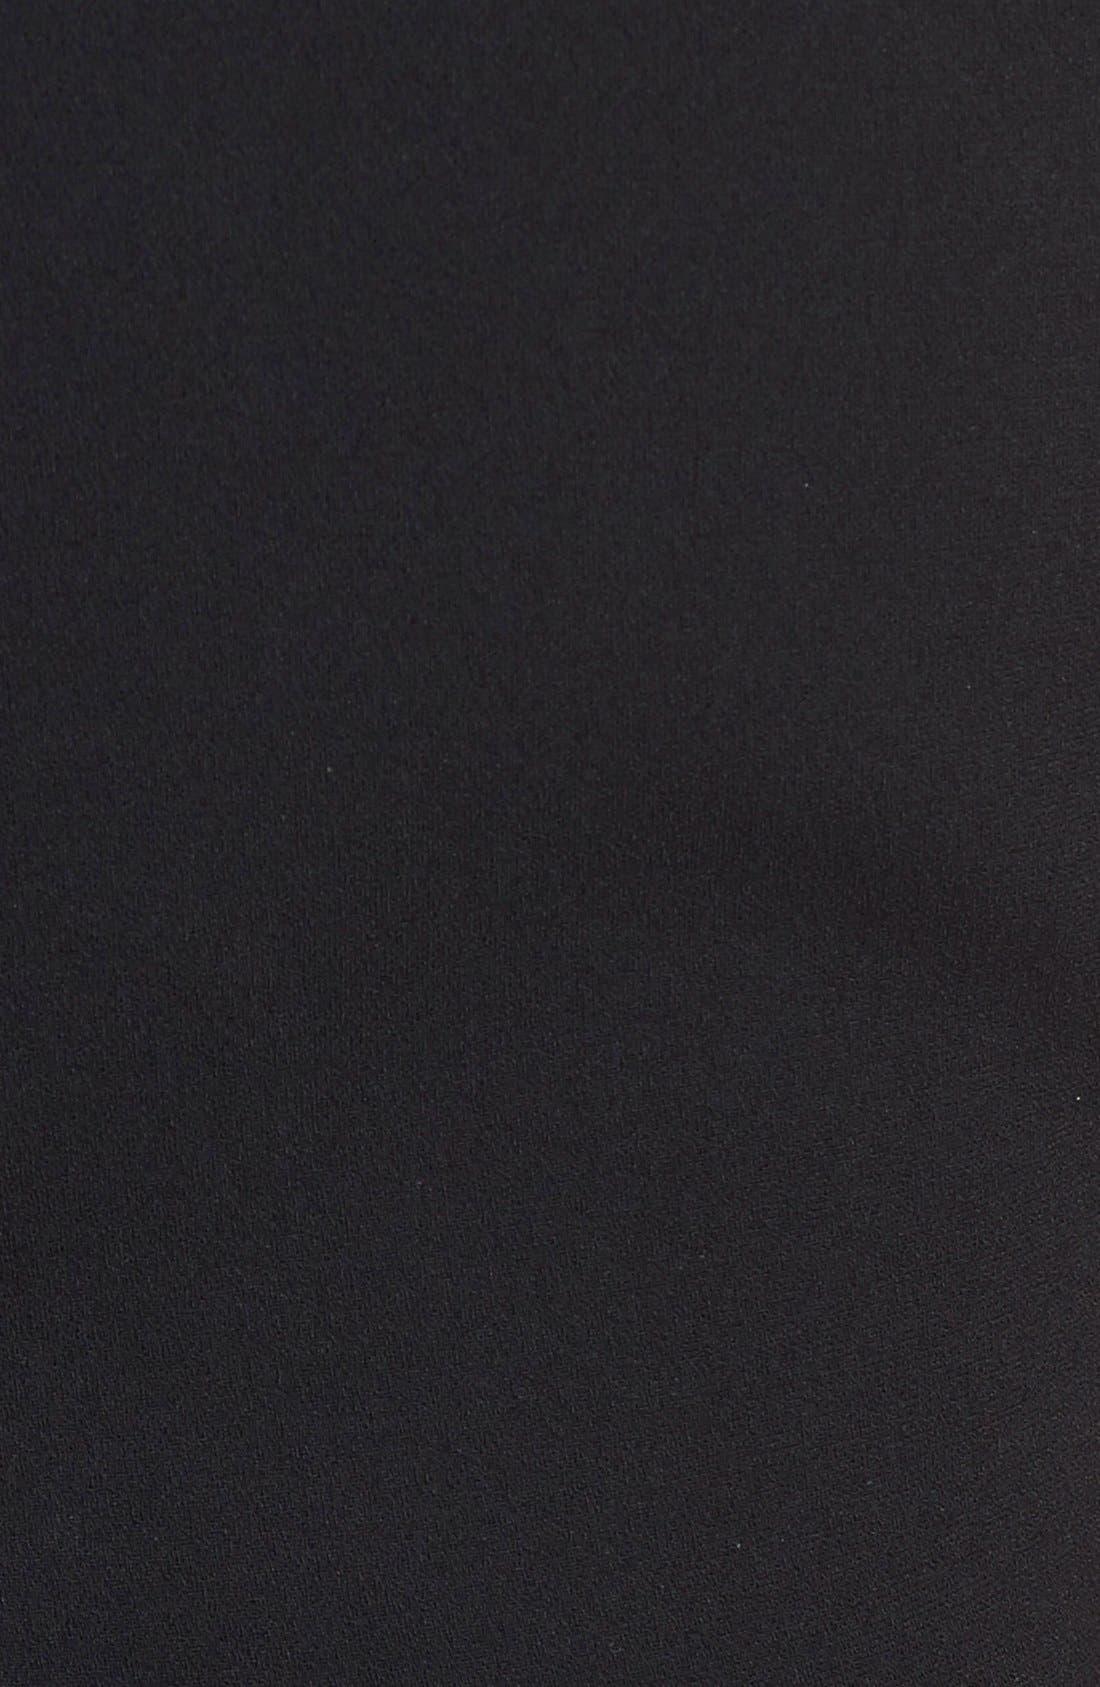 Alternate Image 3  - Victoria Beckham Crepe Sheath Dress